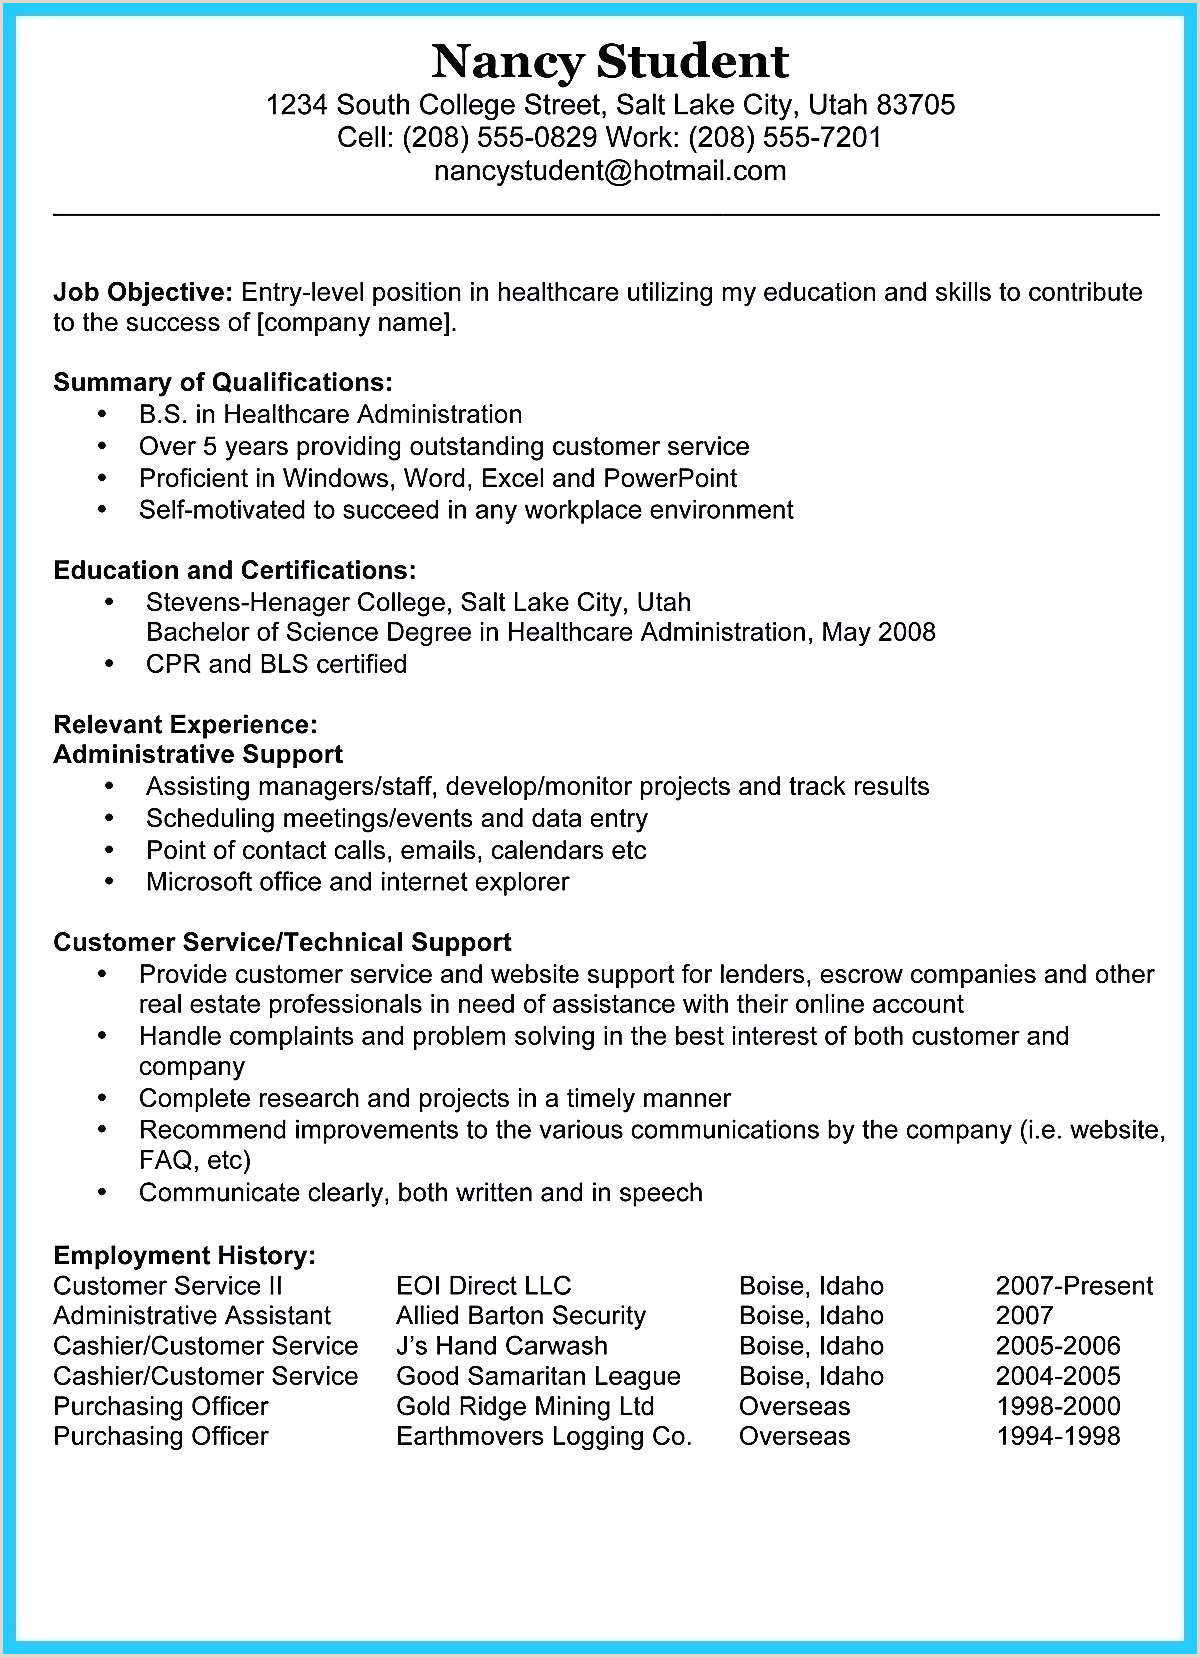 Resume format for Overseas Job Resume Template Sample Professional Petency Based Resume